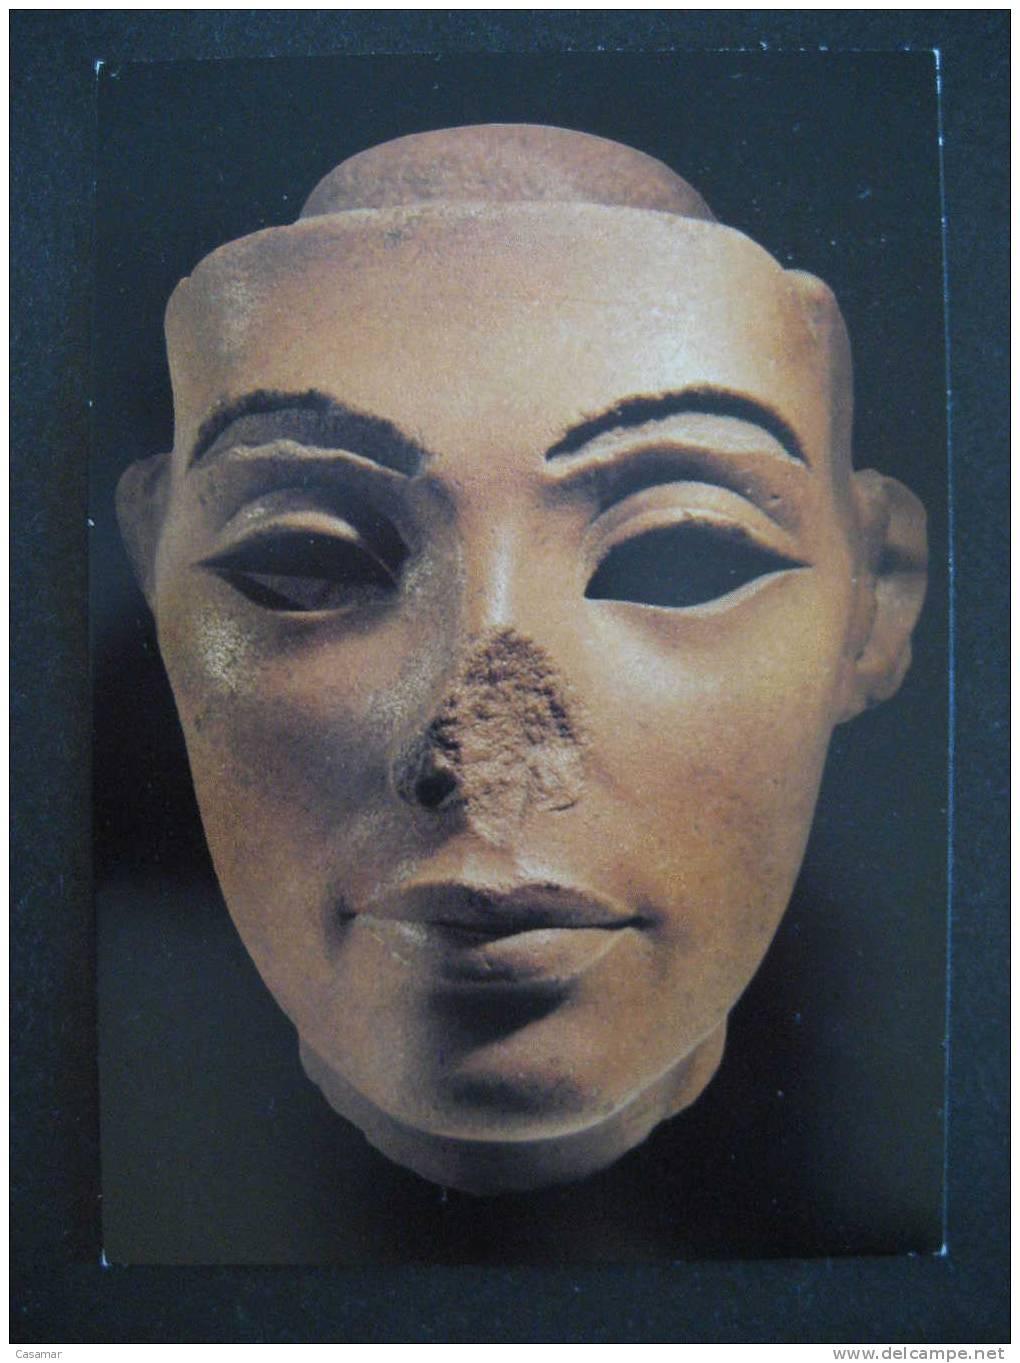 BELGIUM Egypt Egypte Mit Rahina Archeology Archeologie Prehistory Prehistoire Art Arqueologia Prehistoria - Historia